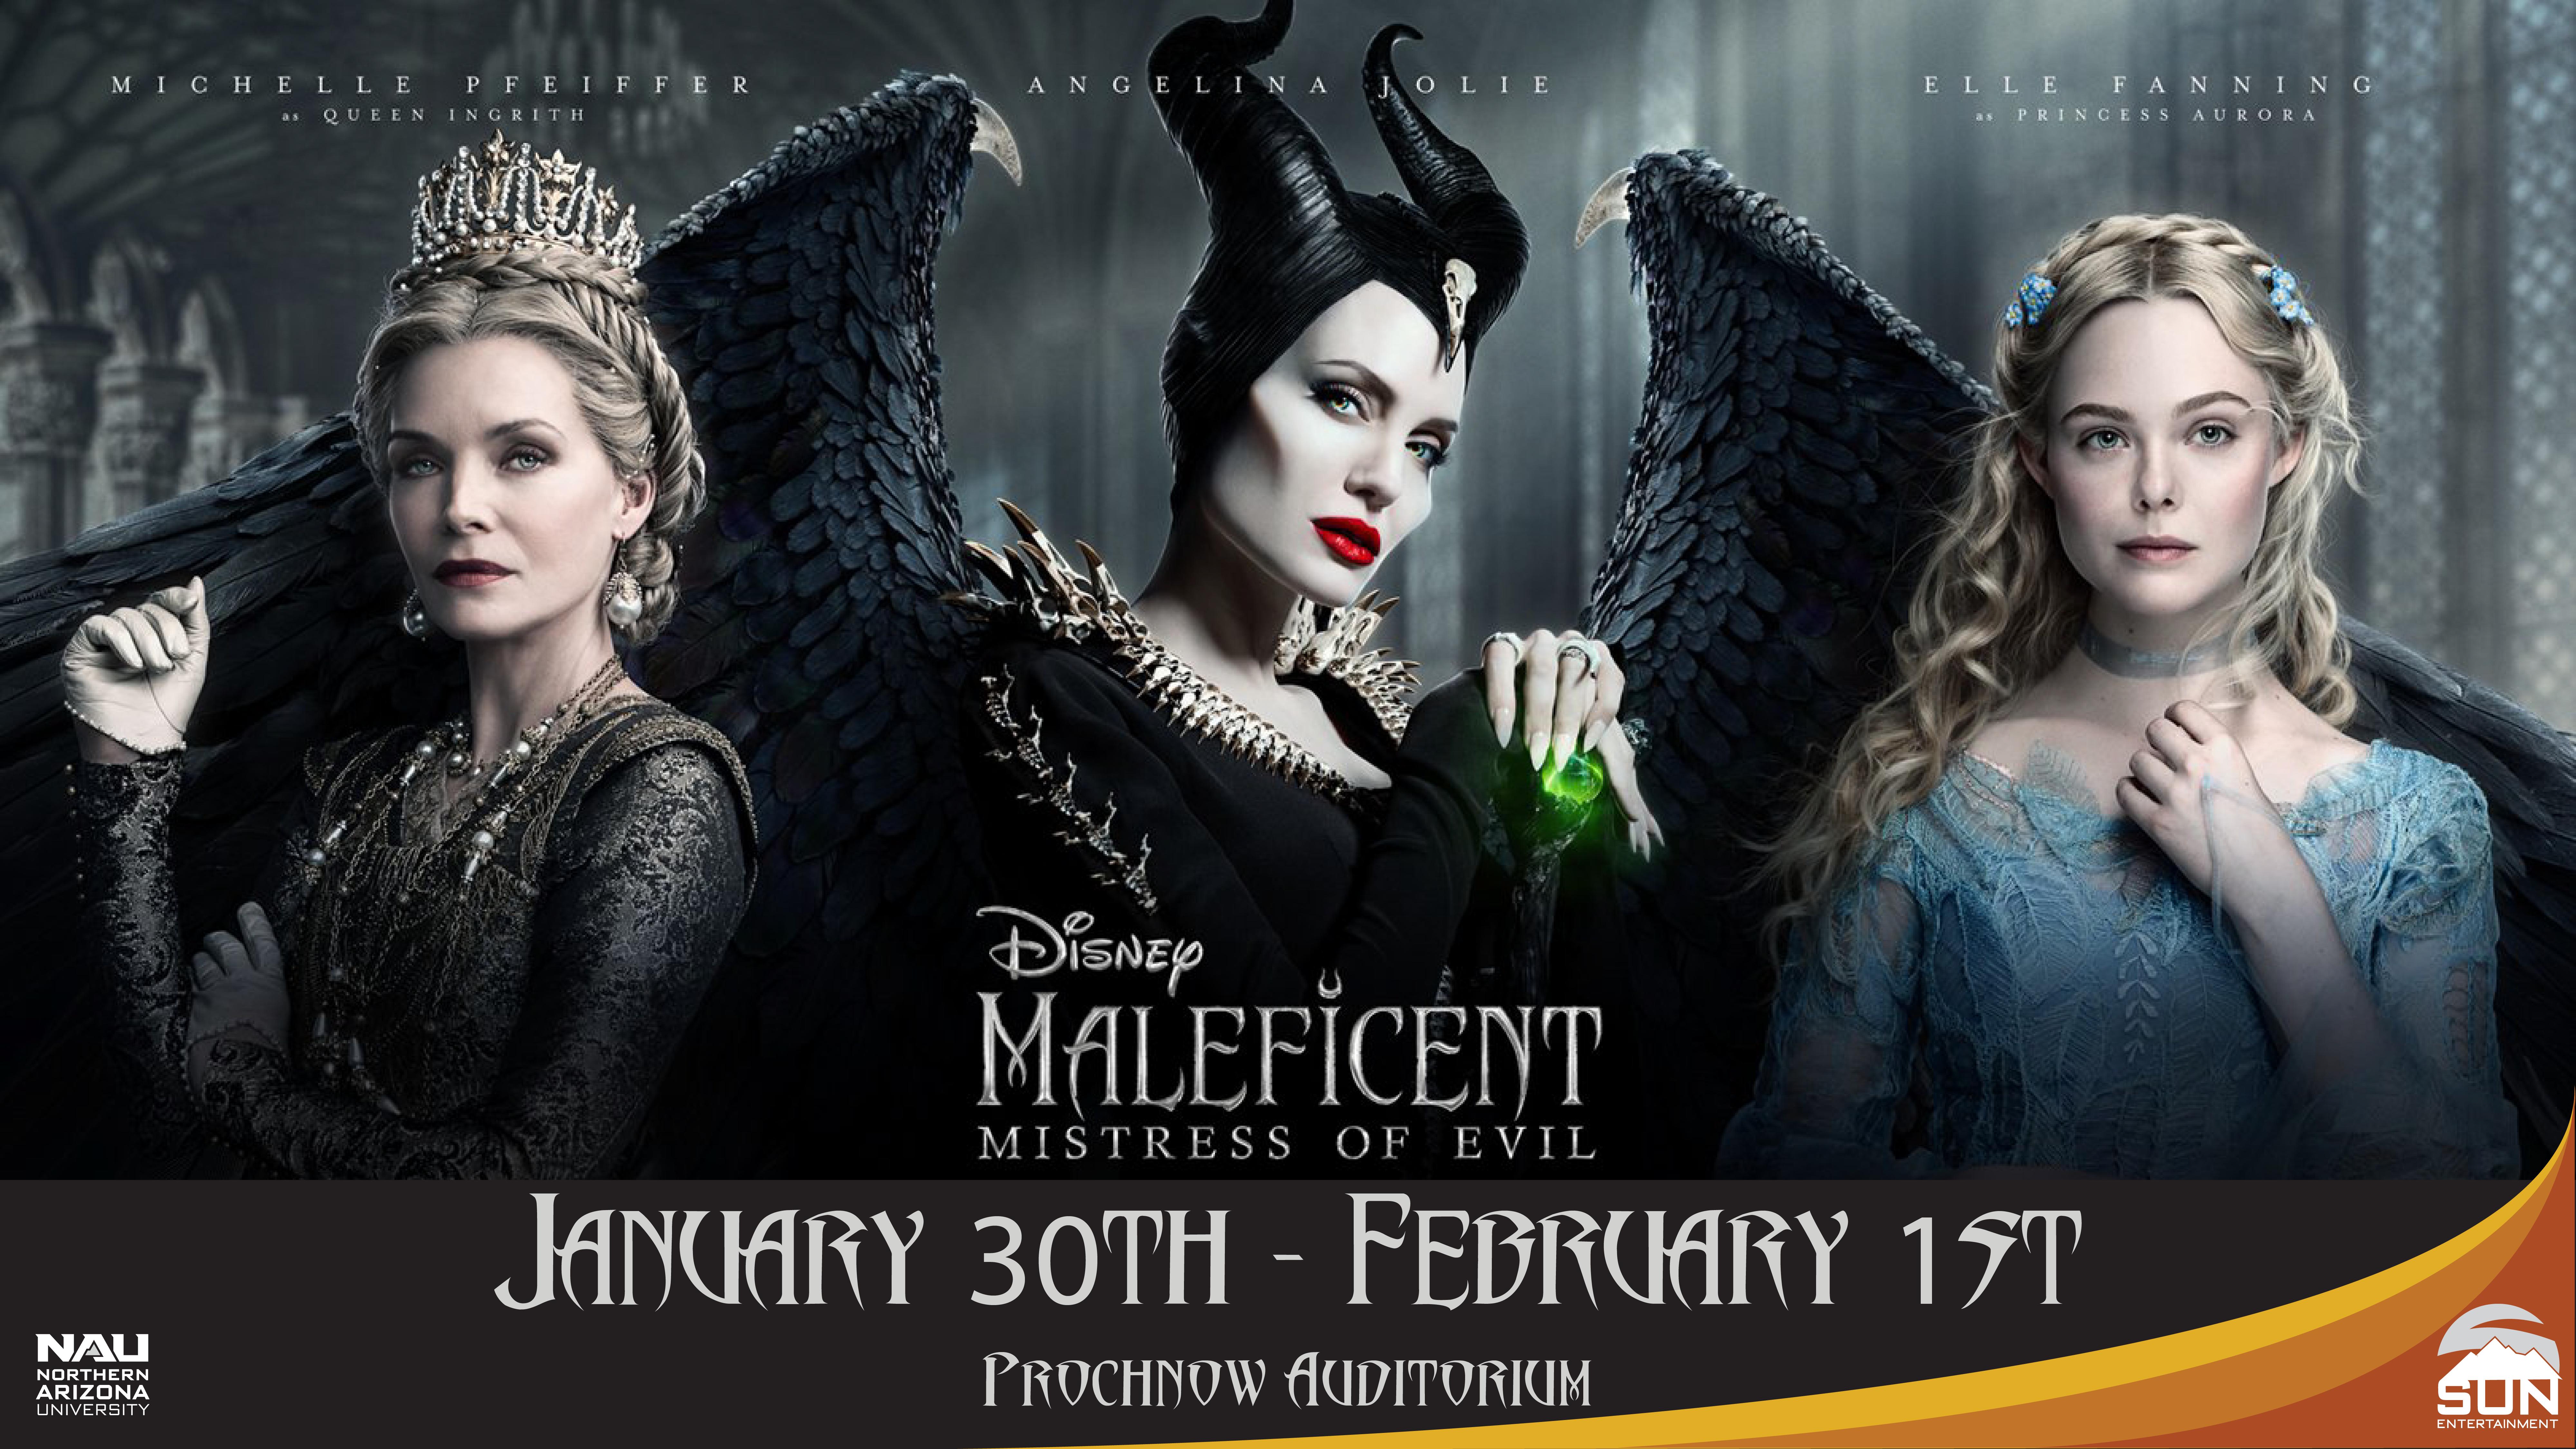 Maleficent Slide-01.png